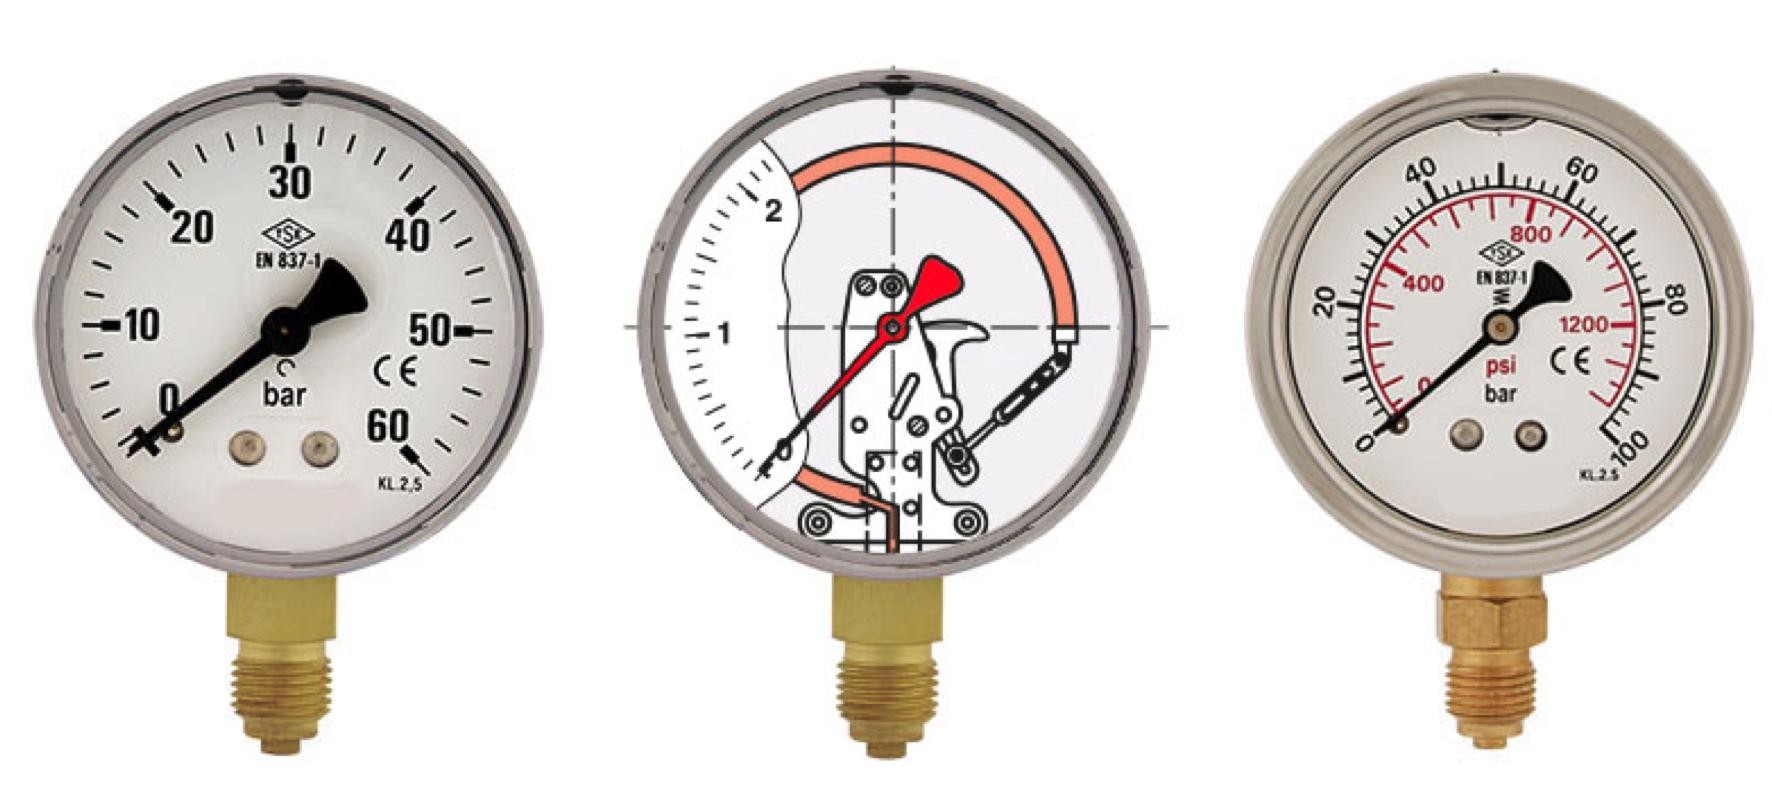 monometre basınç saati